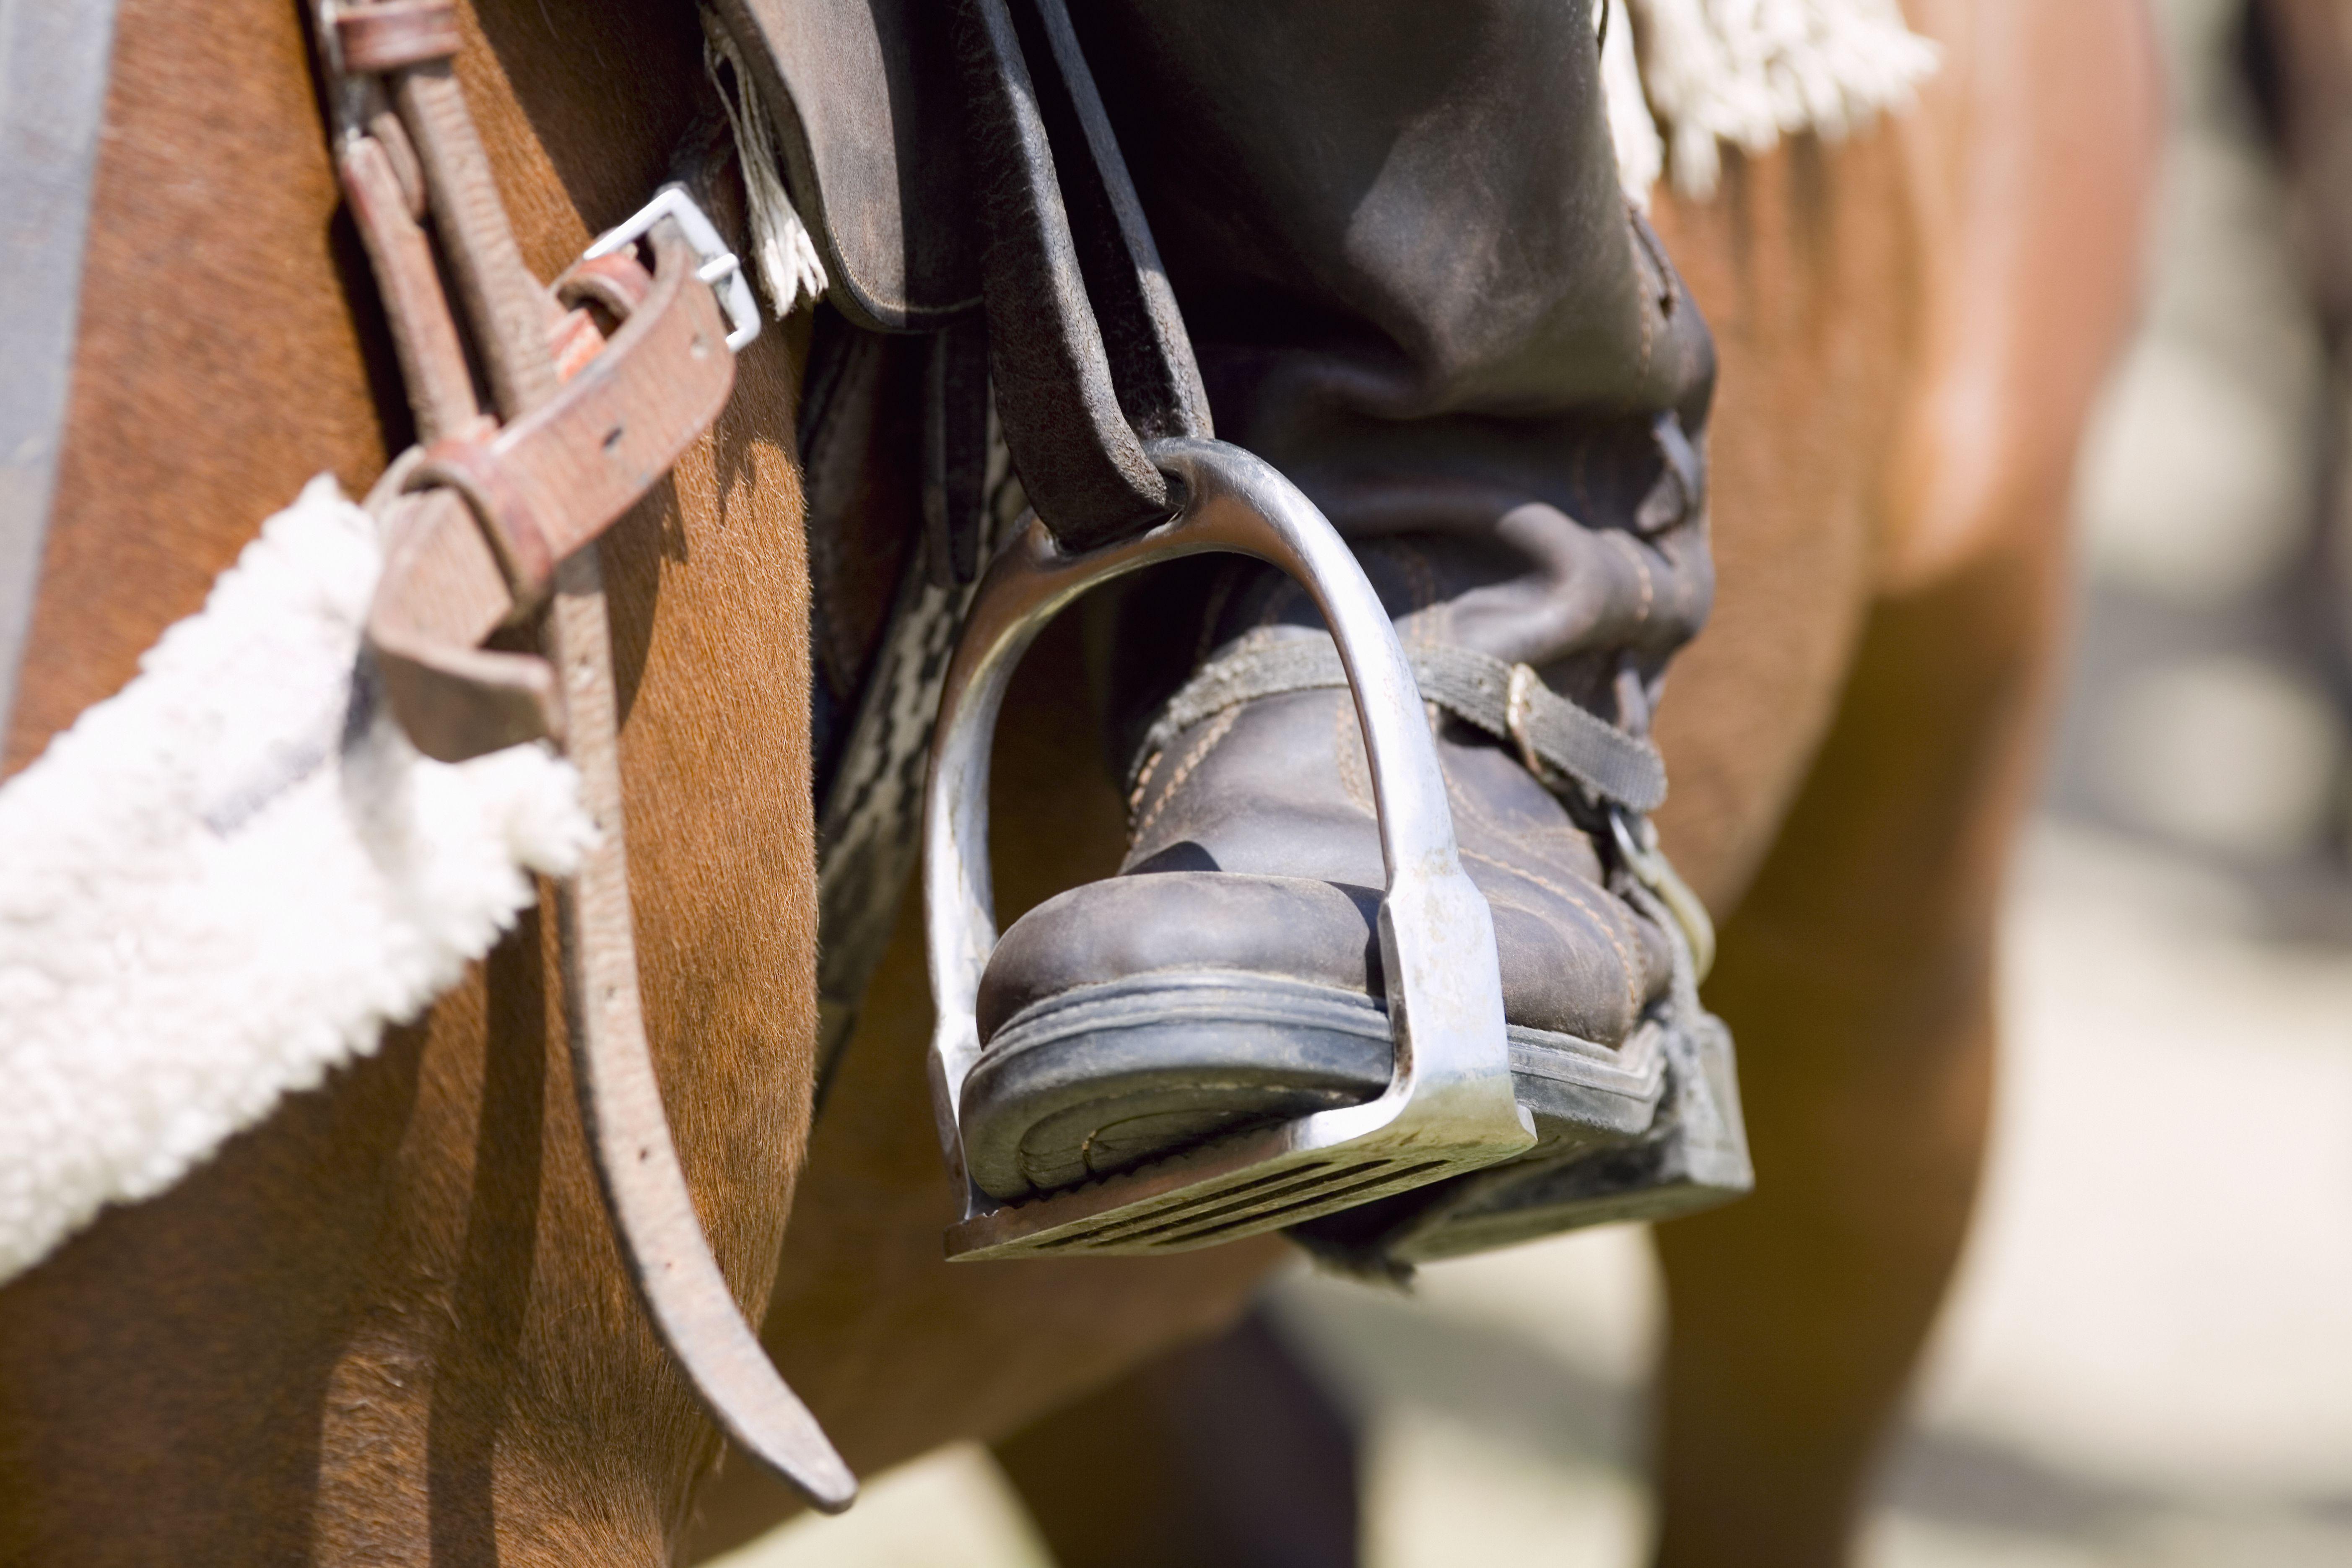 Close-up of a person's leg in a stirrup